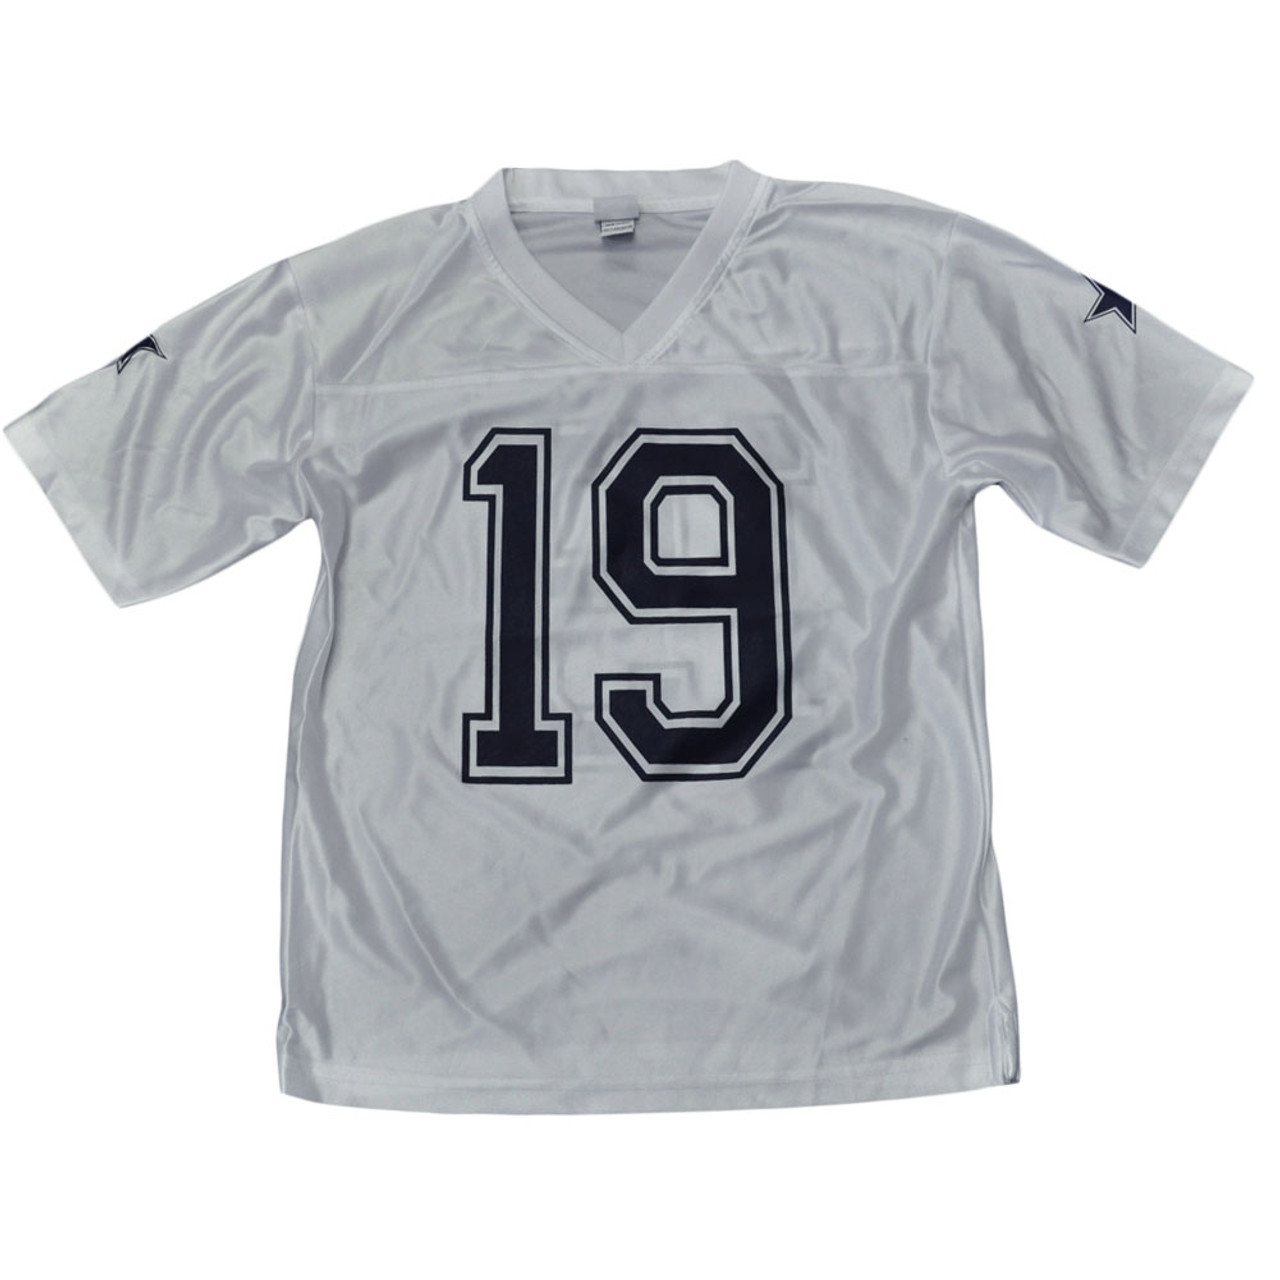 online retailer 14acb a222e NFL Dallas Cowboys Football Womens Ladies V-Neck Miles Austin 19 White  Jersey